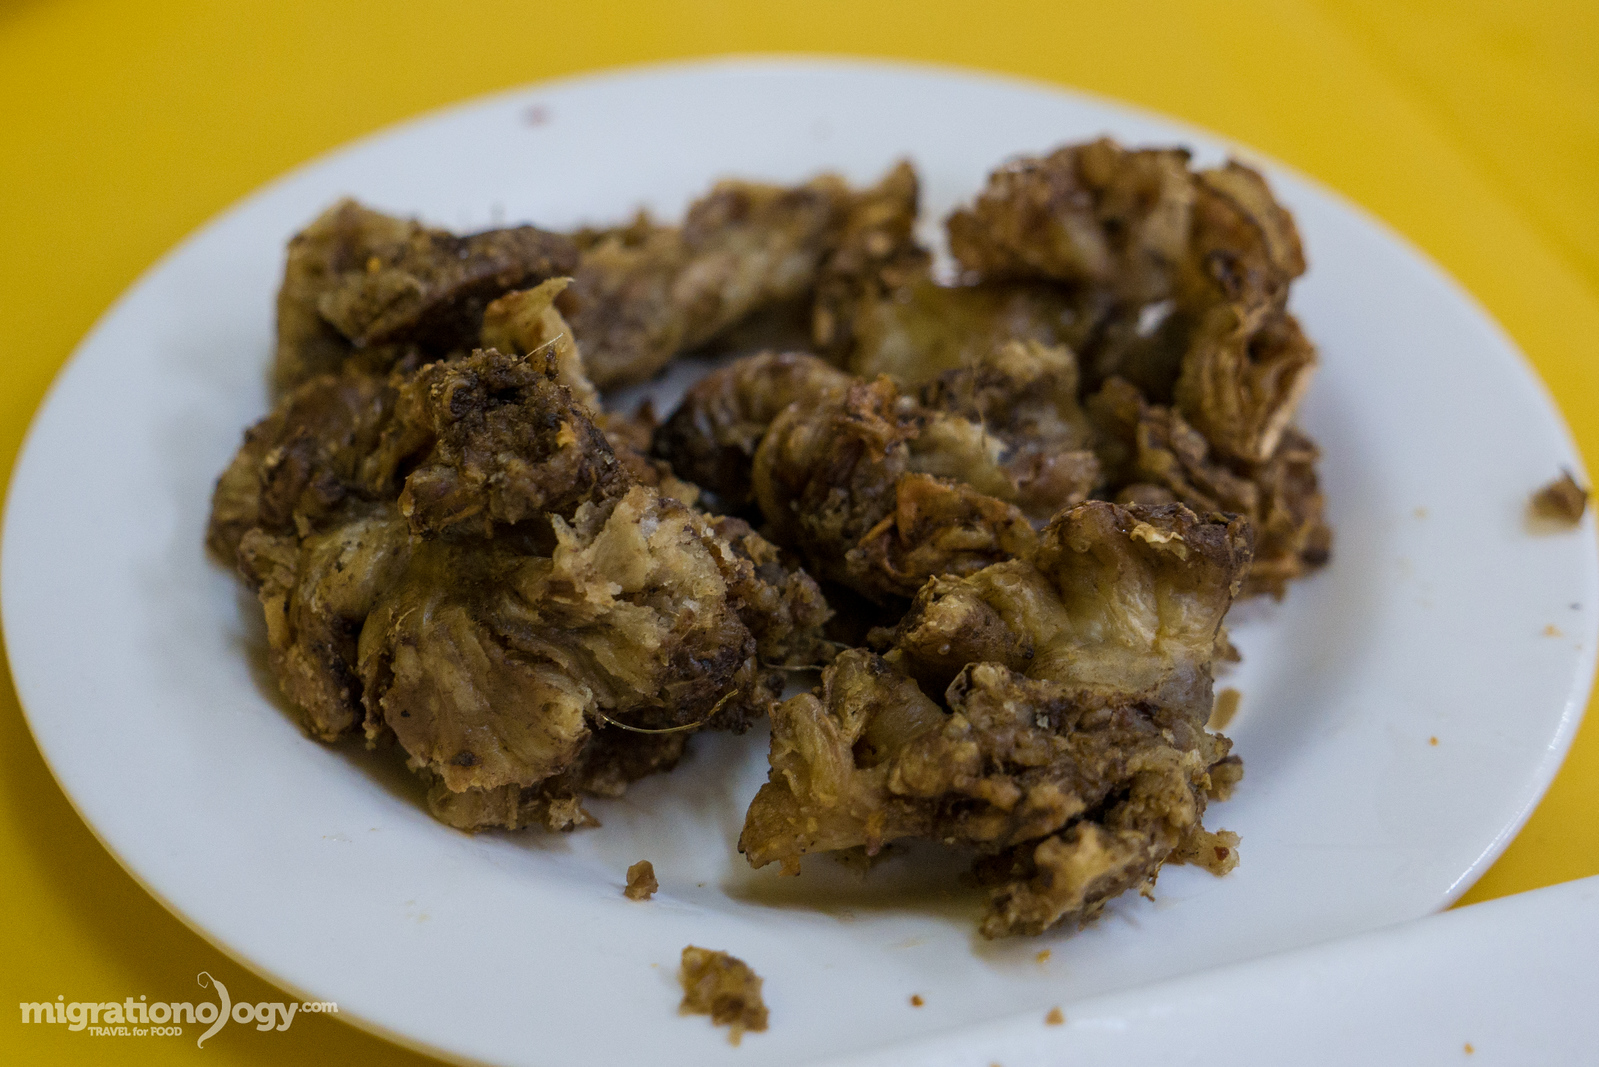 Filipino food tour